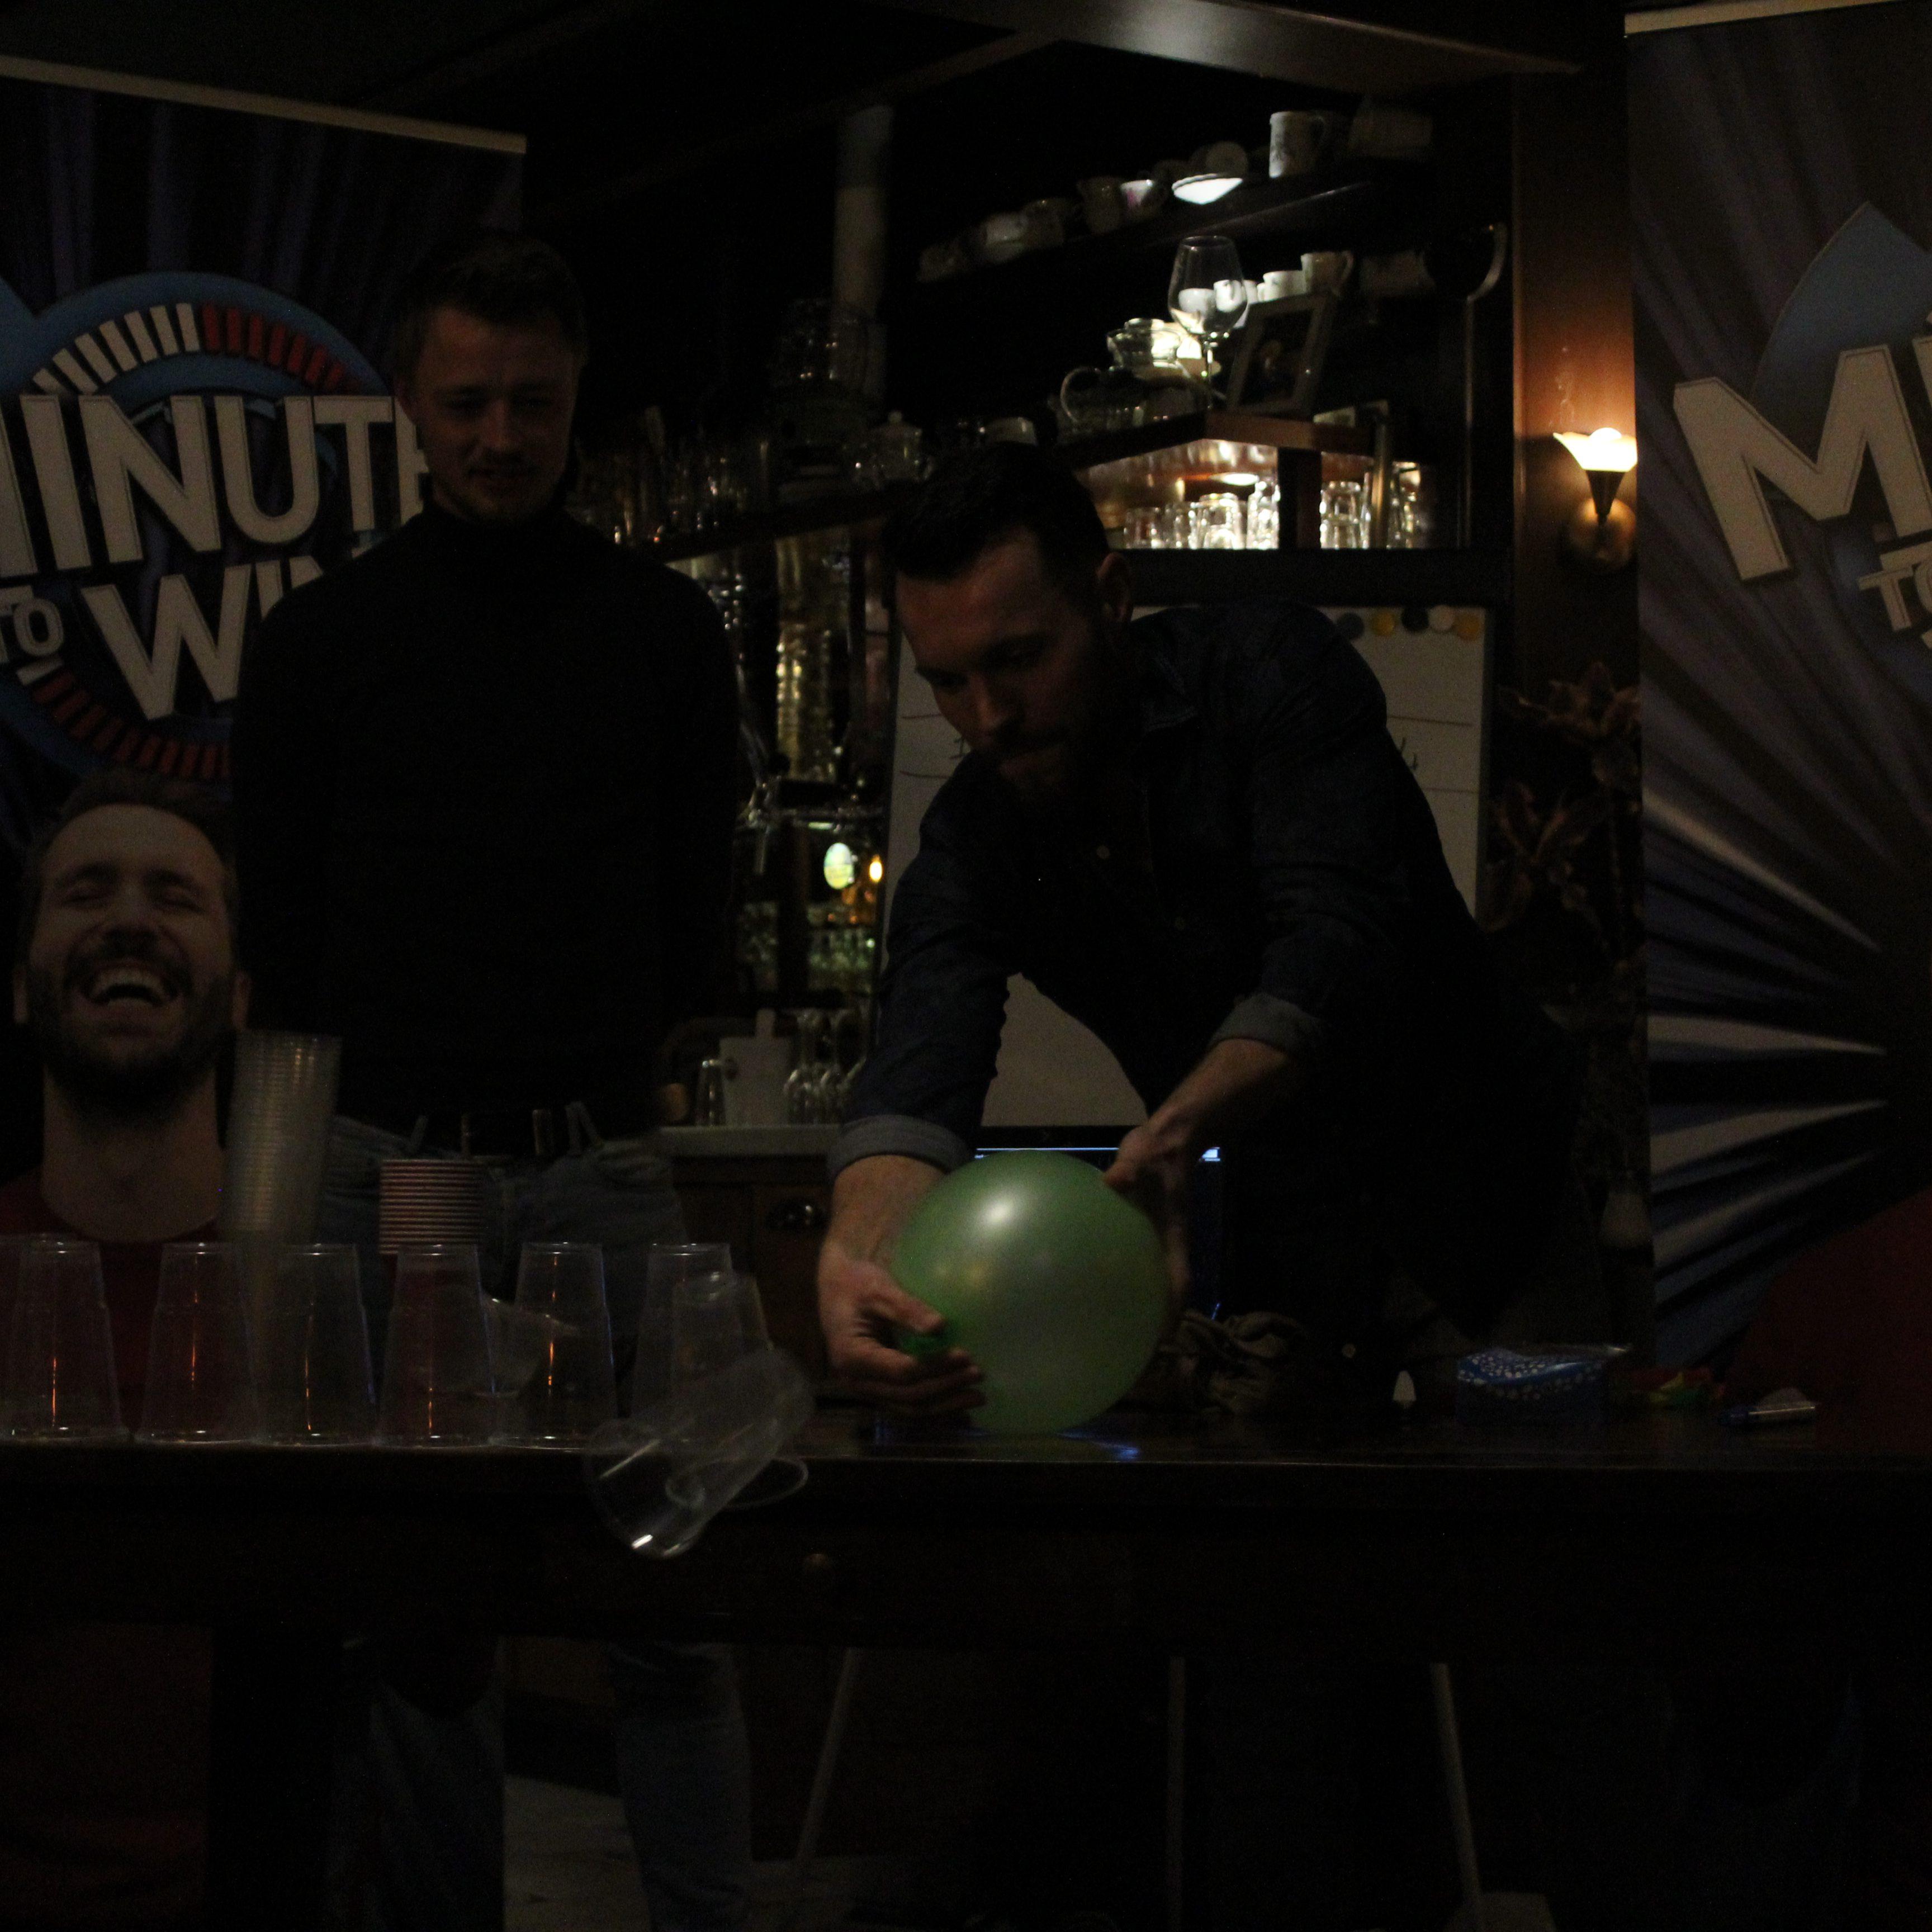 MInute to win it -groningen-drenthe